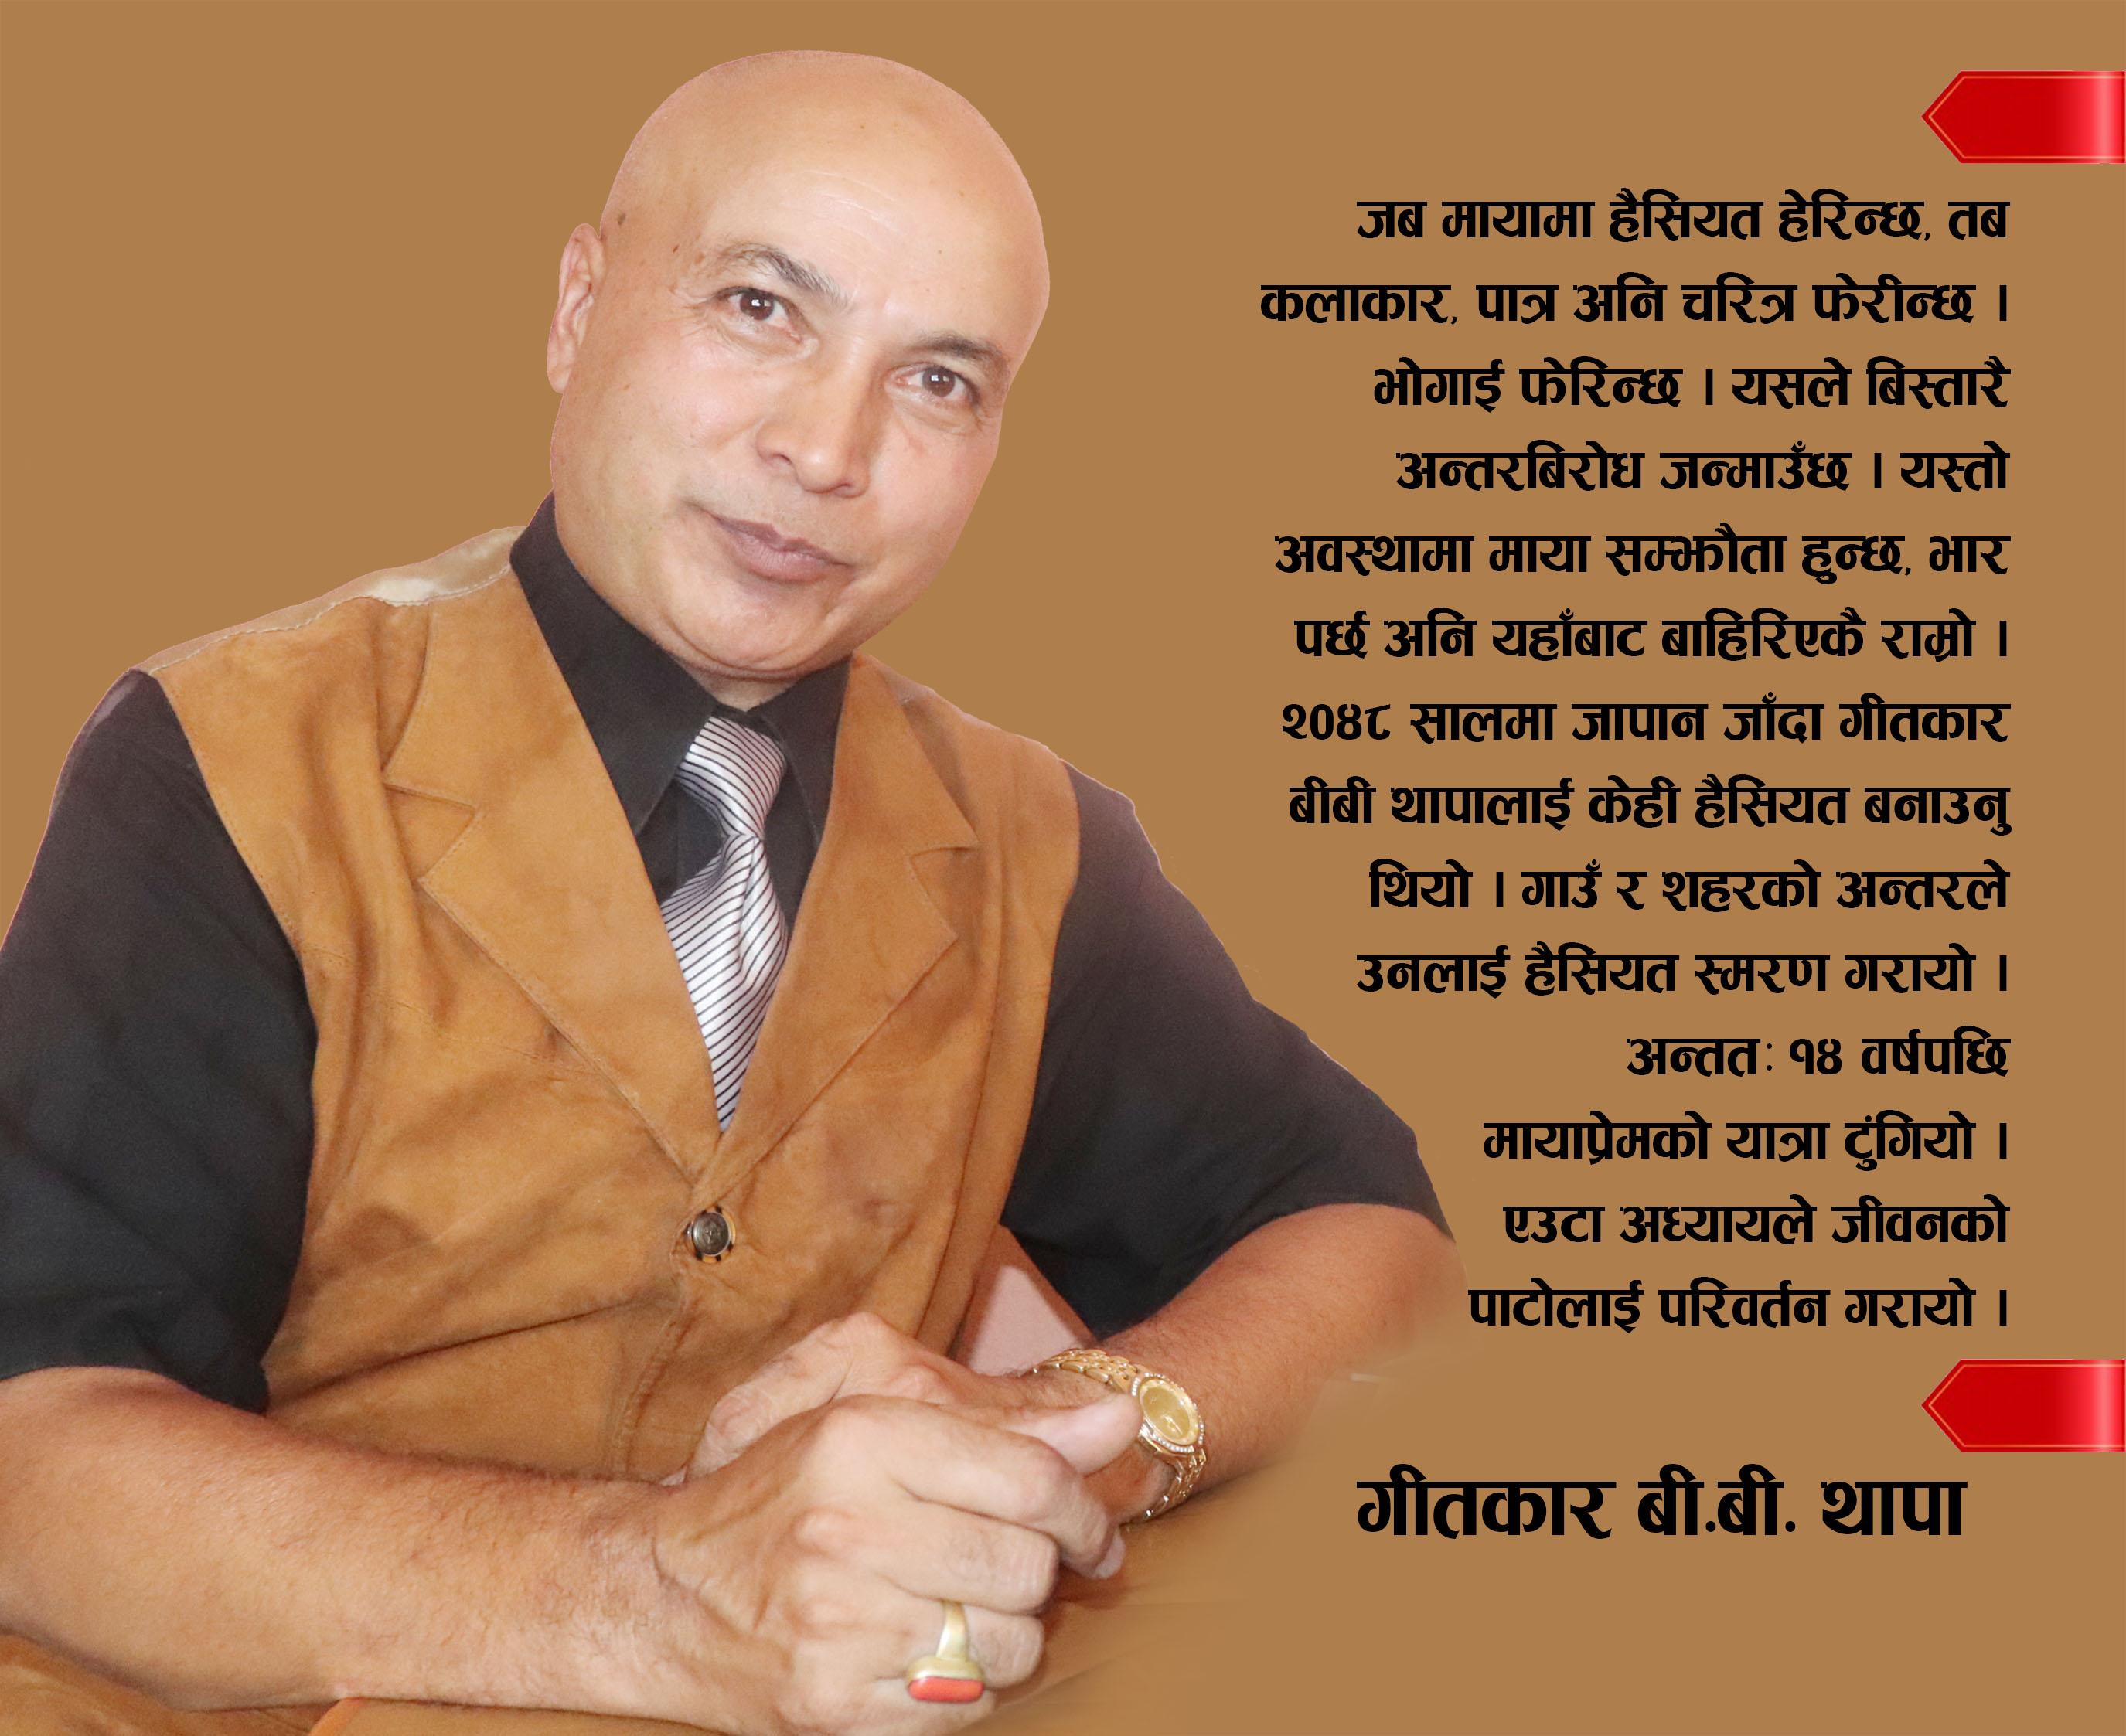 Lyricist B.B. Thapa